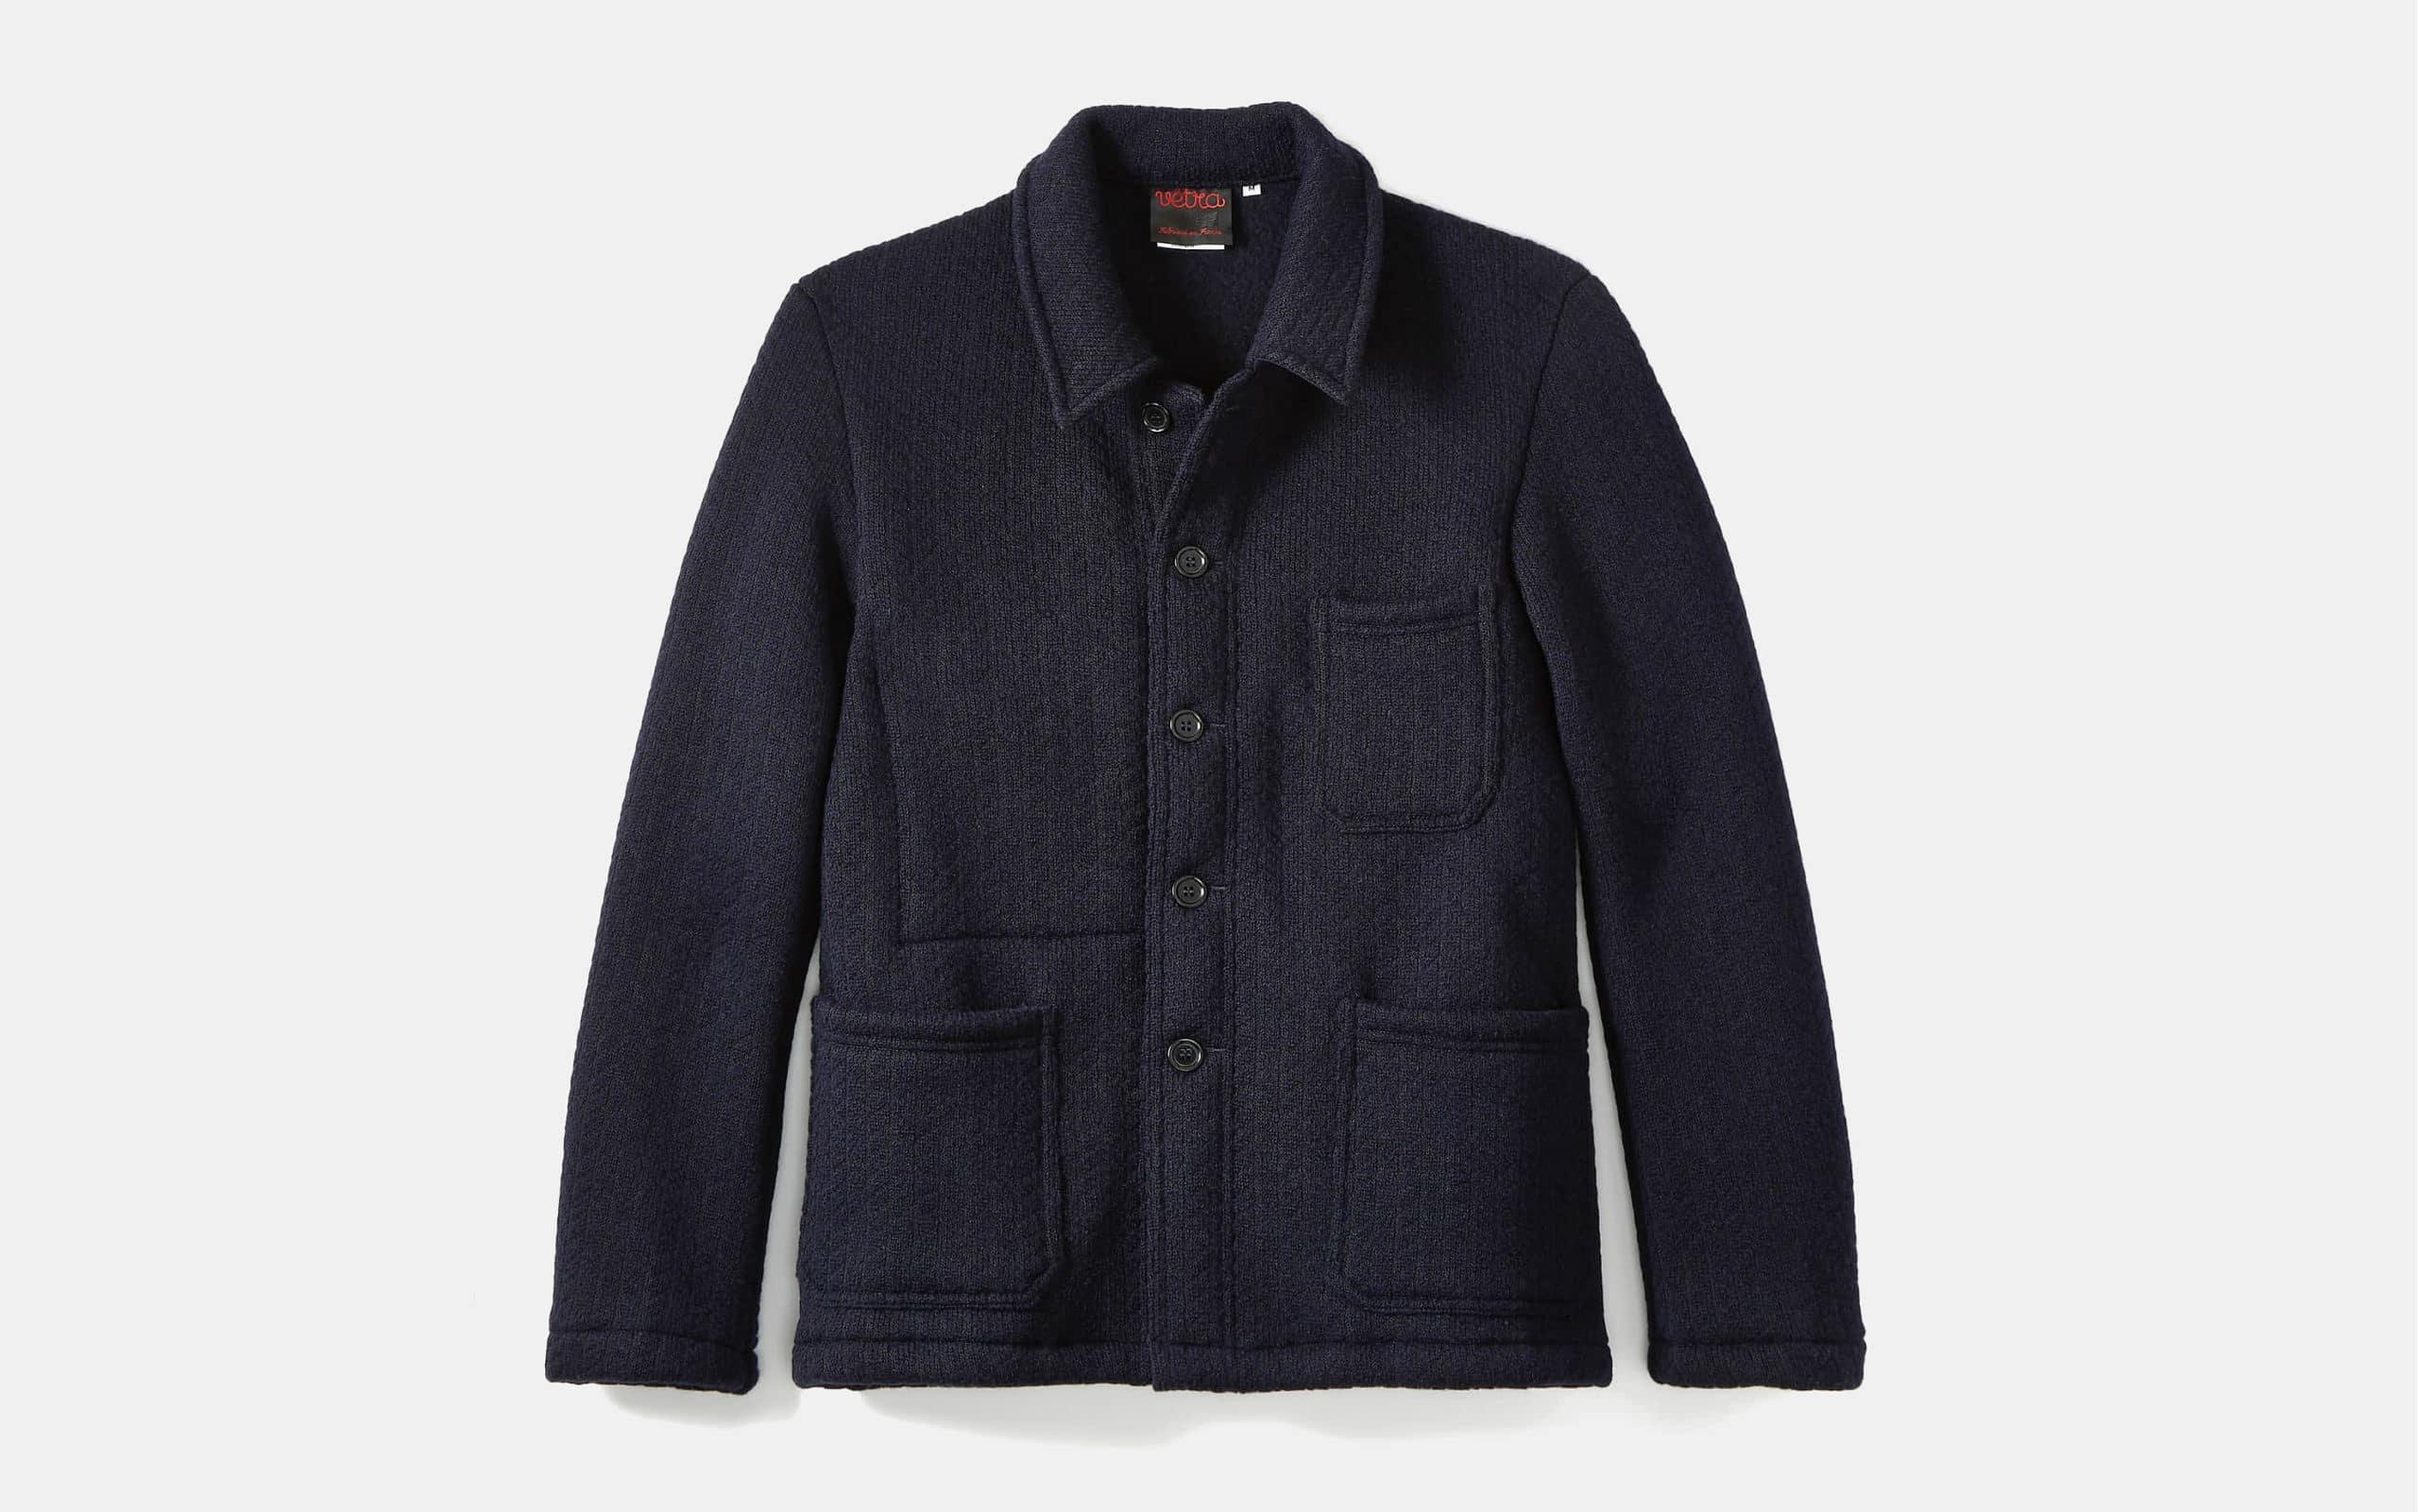 Vetra Wool Herringbone Chore Jacket